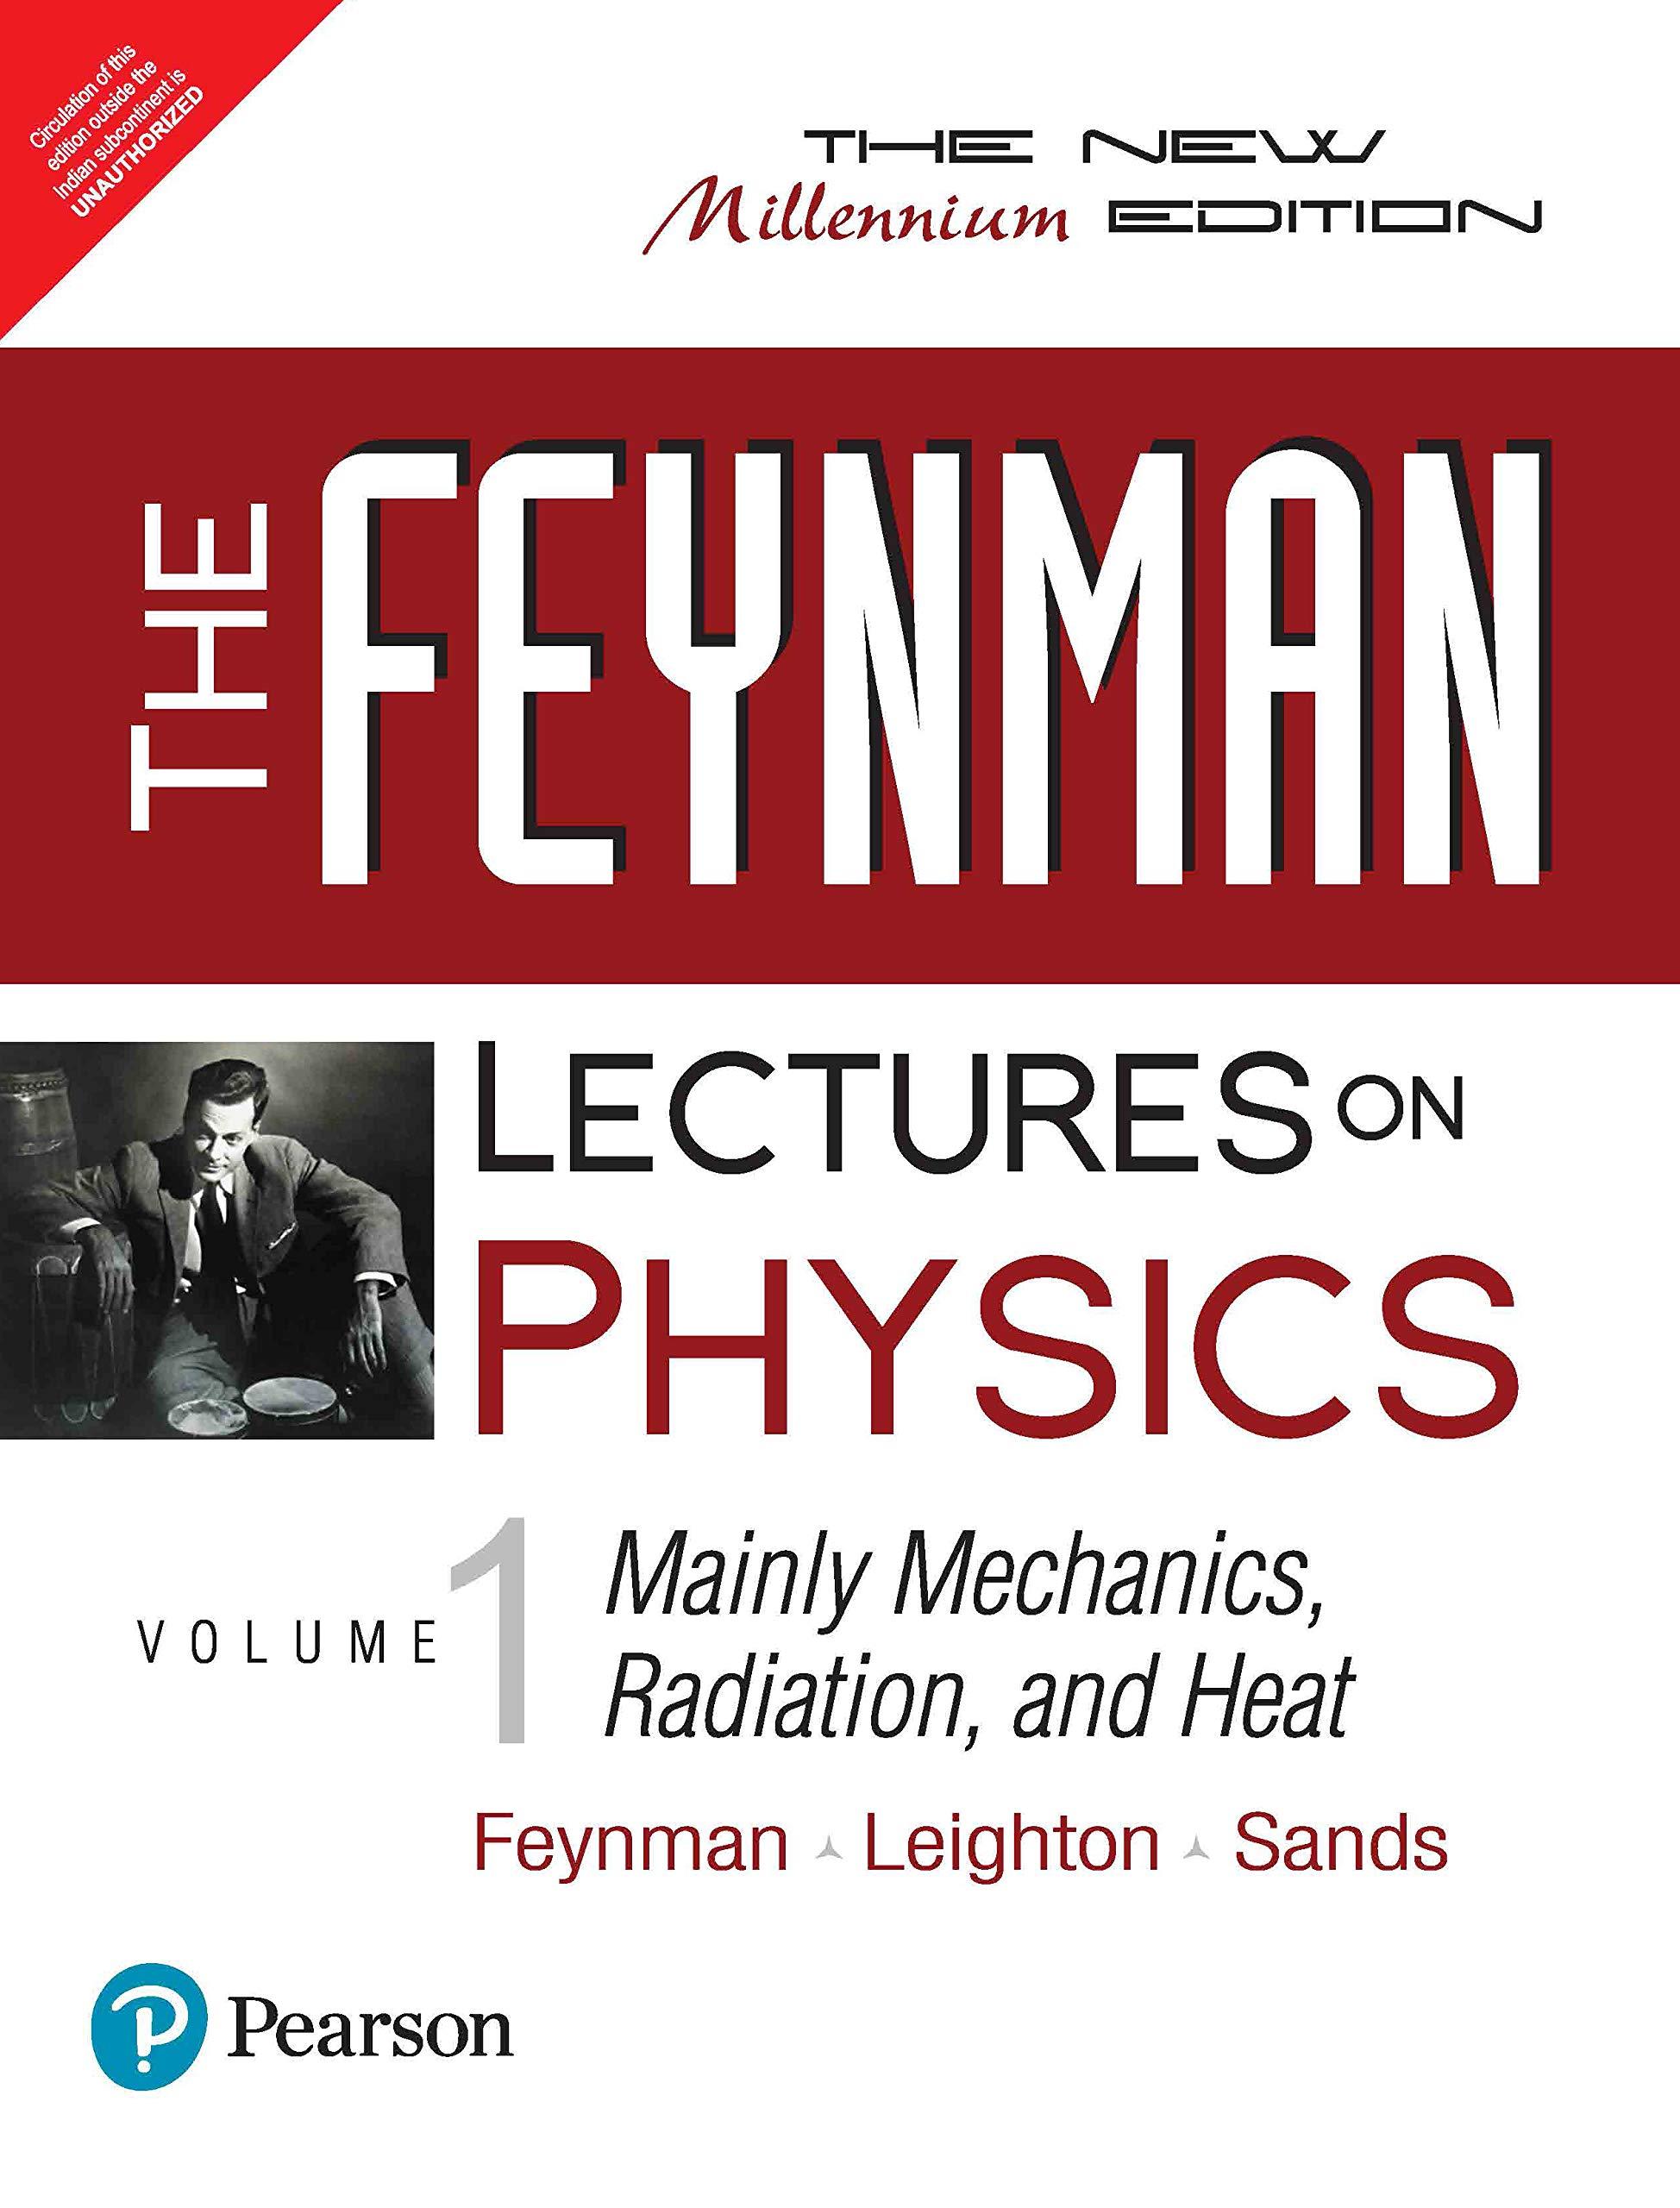 Ebook The Feynman Lectures On Physics By Richard P Feynman